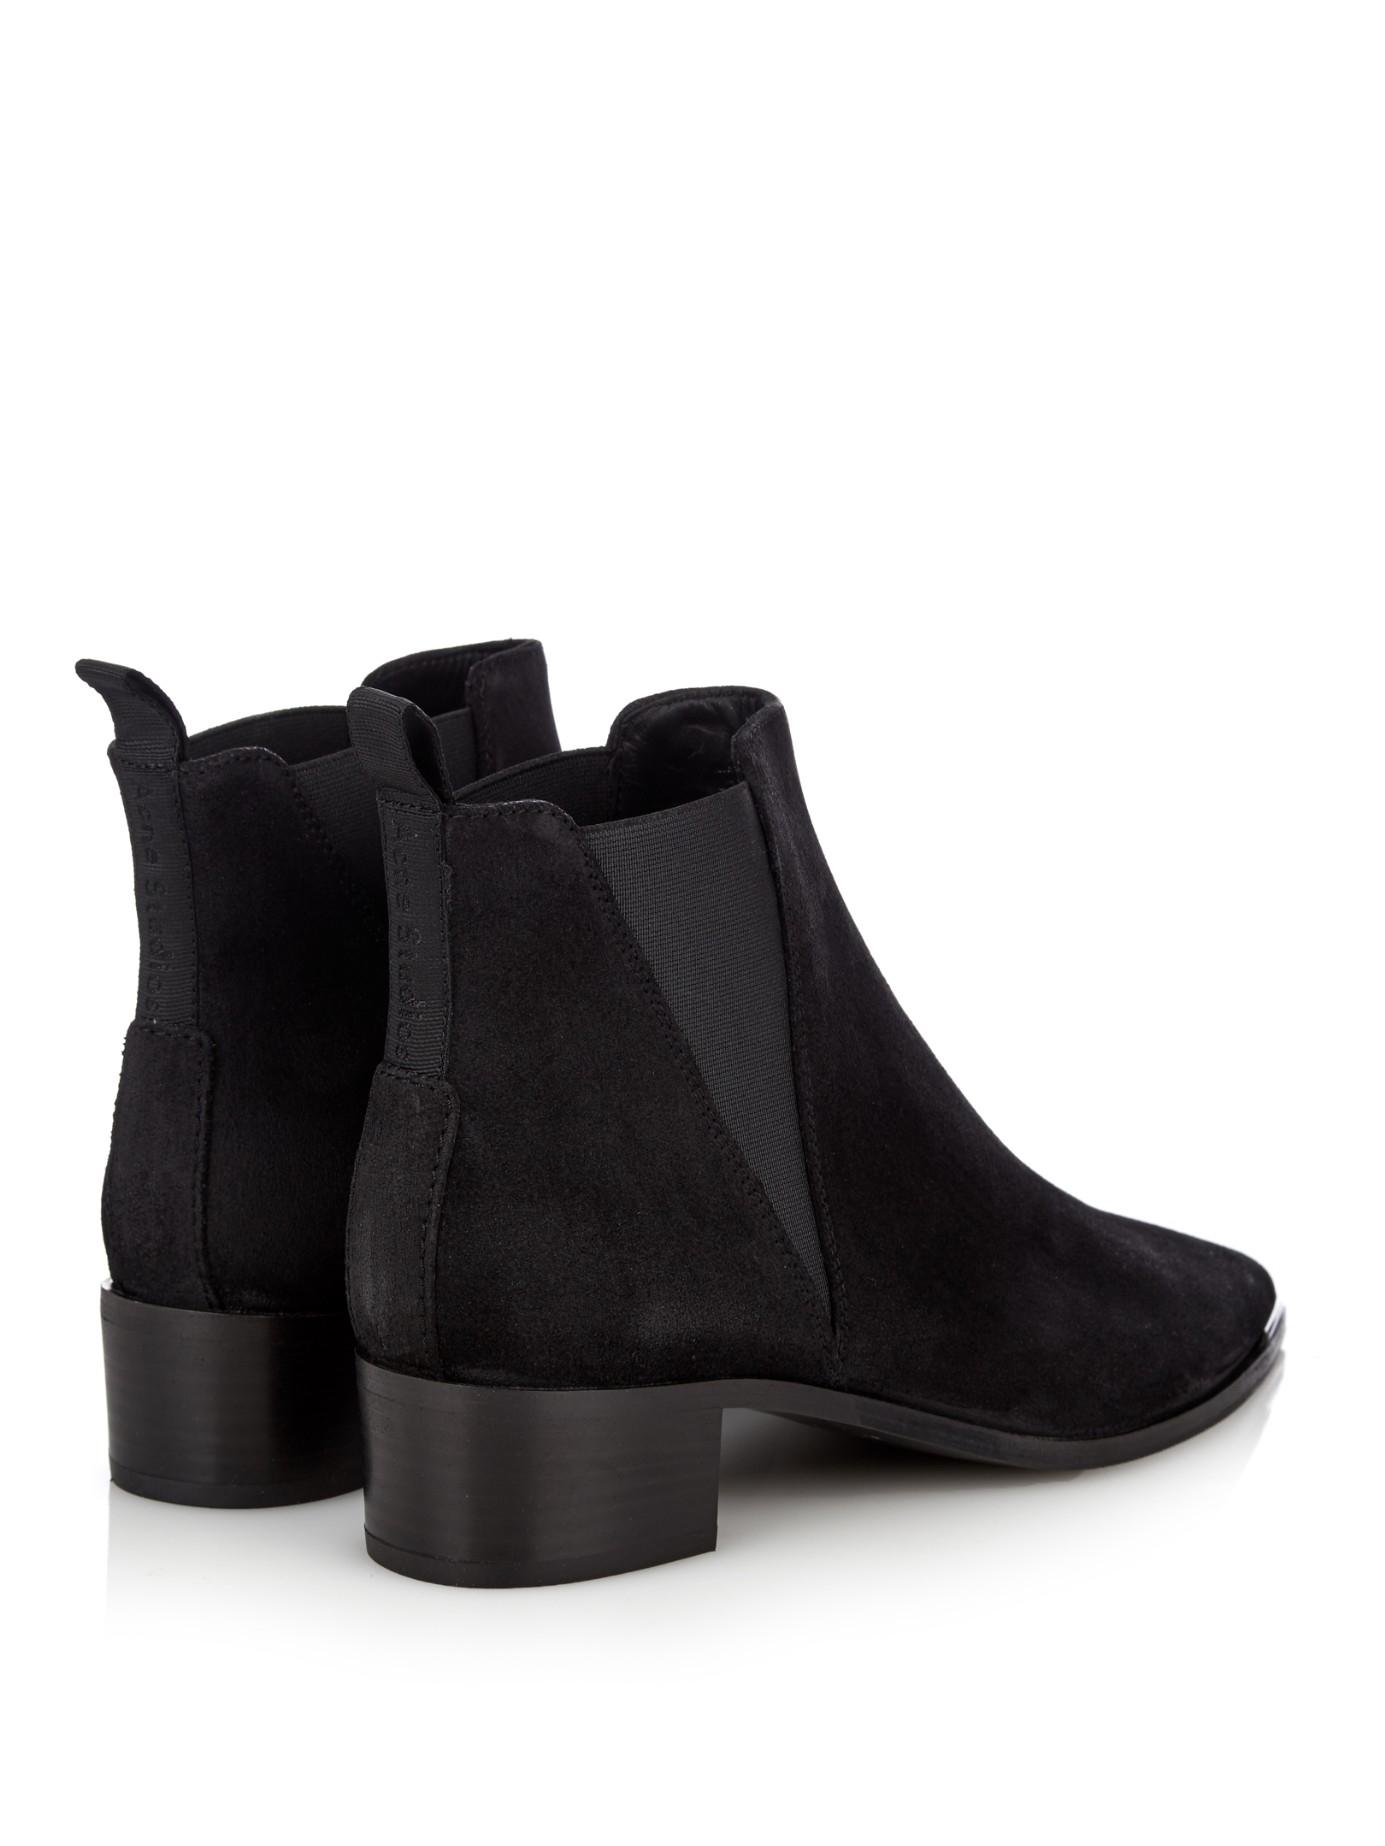 acne studios jensen suede chelsea boots in black lyst. Black Bedroom Furniture Sets. Home Design Ideas